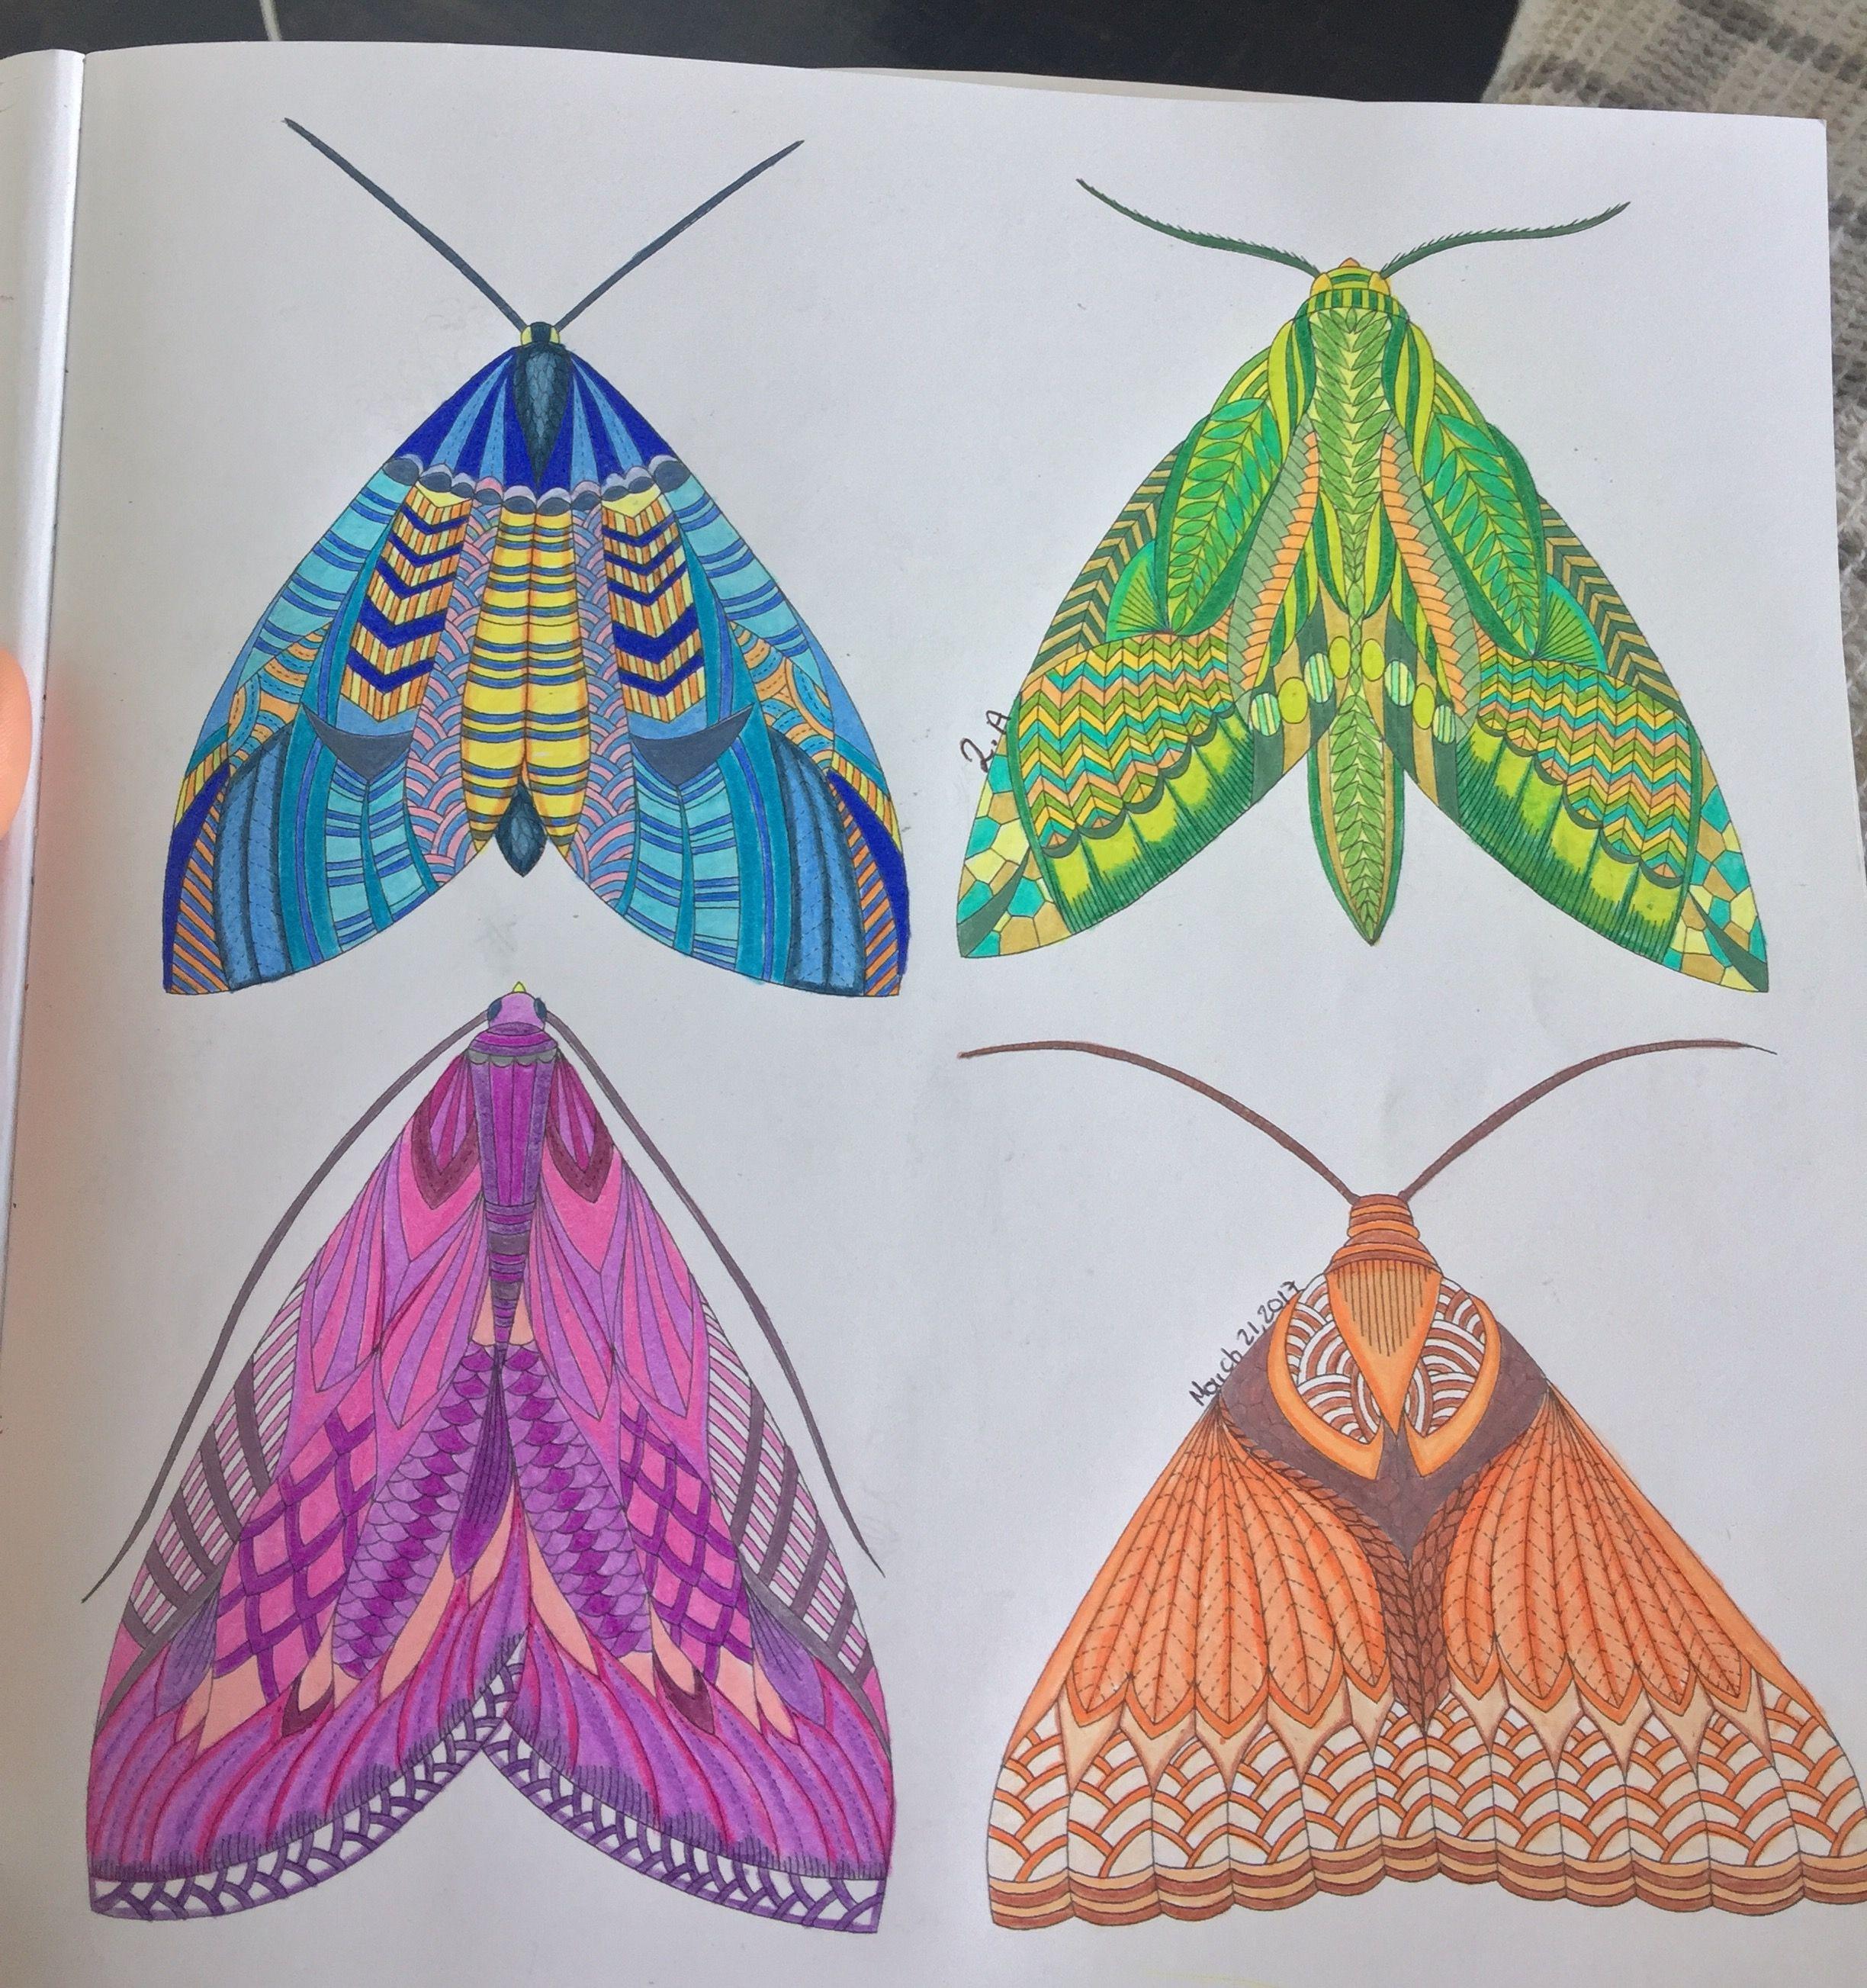 Animal Kingdom Millie Marotta Color Me Draw Moths Coloring Book Moth Millie Marotta Animal Kingdom Animal Kingdom Colouring Book Millie Marotta